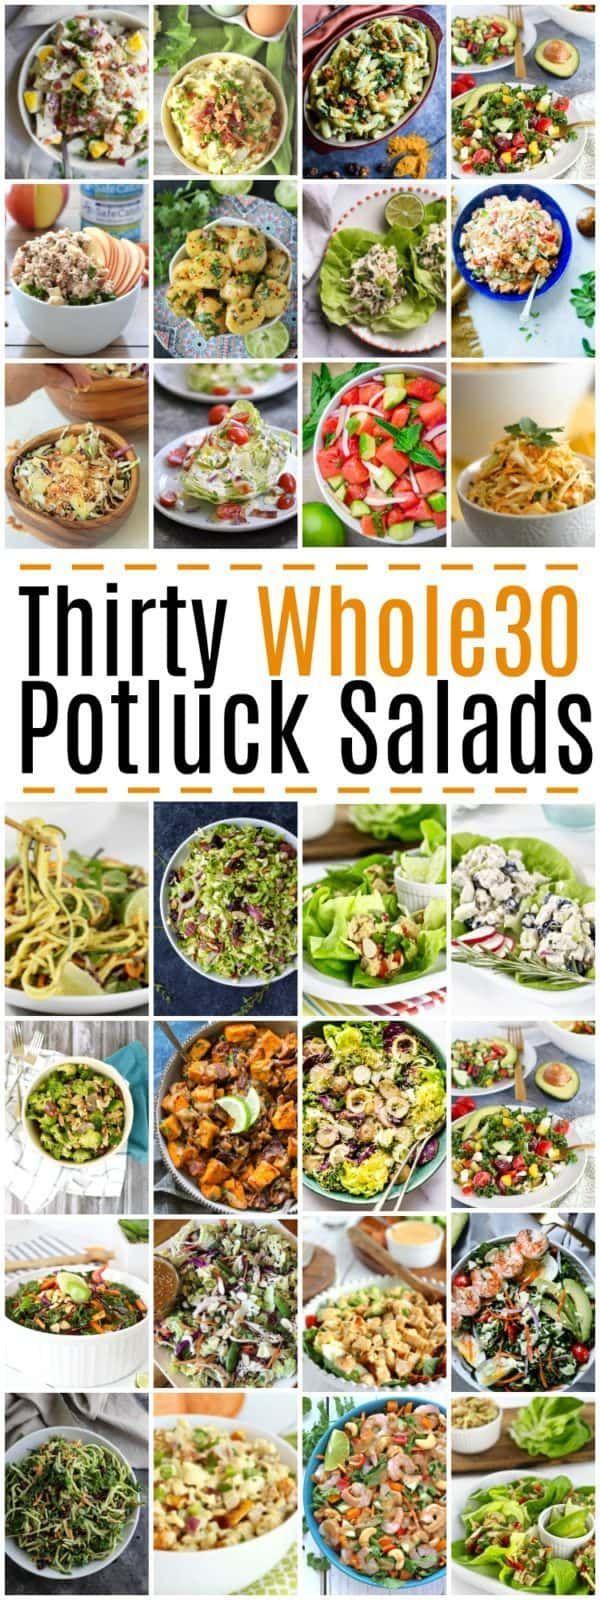 30 Whole30 Potluck Salads #potluck #salads #whole30 #healthyrecipes